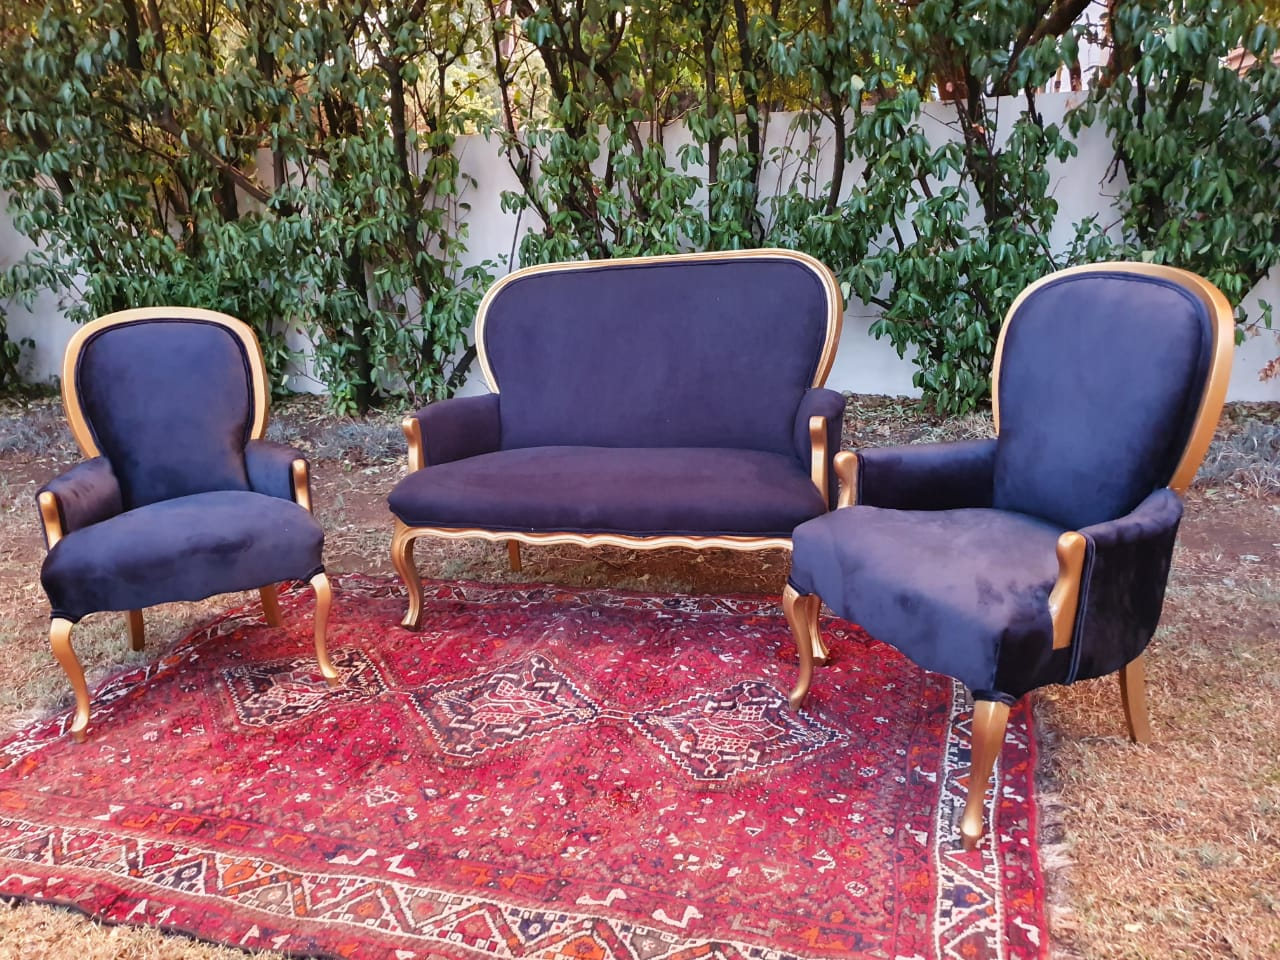 Victorian Style Furniture With Queen Anne Feet 3 Piece Set